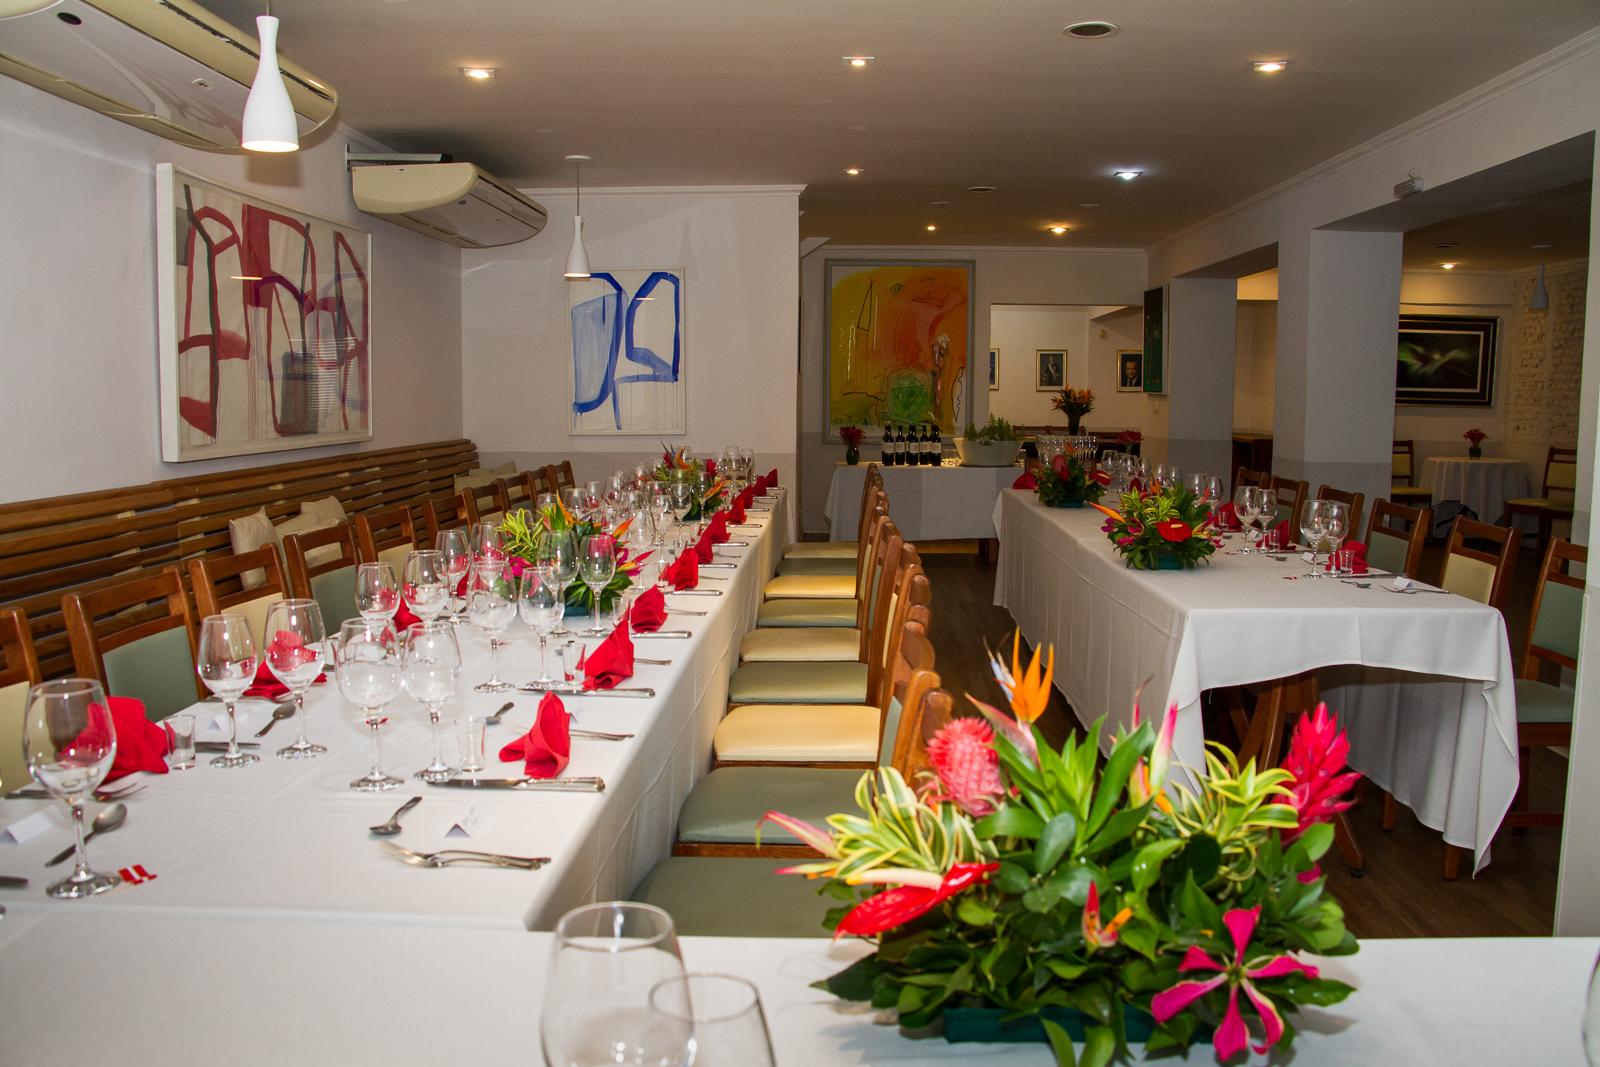 foto do restaurante na visita da Princesa Benedikte da Dinamarca no Brasil